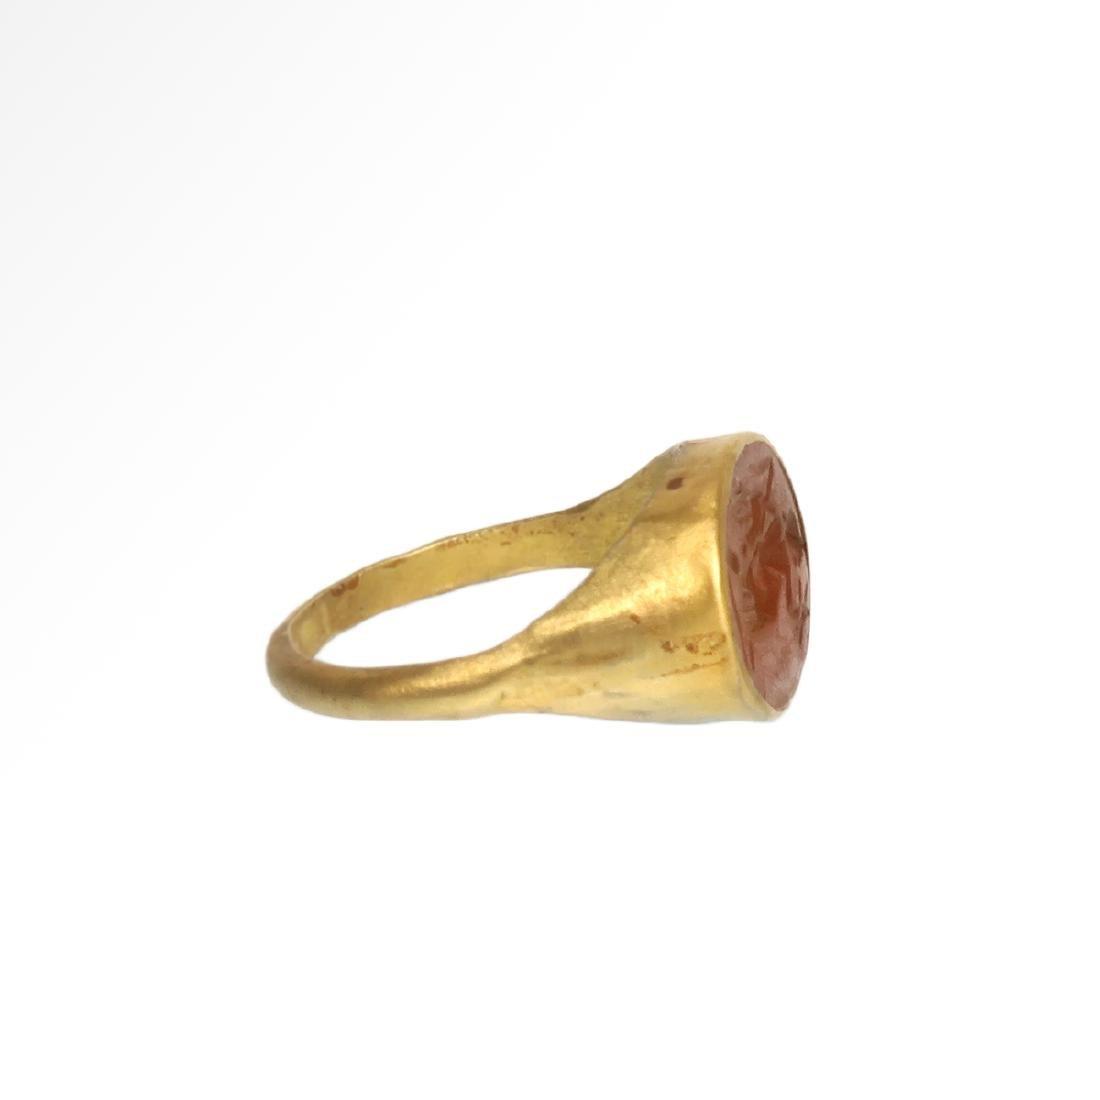 Roman Gold Ring with Cornelian Intaglio with Goddess - 5